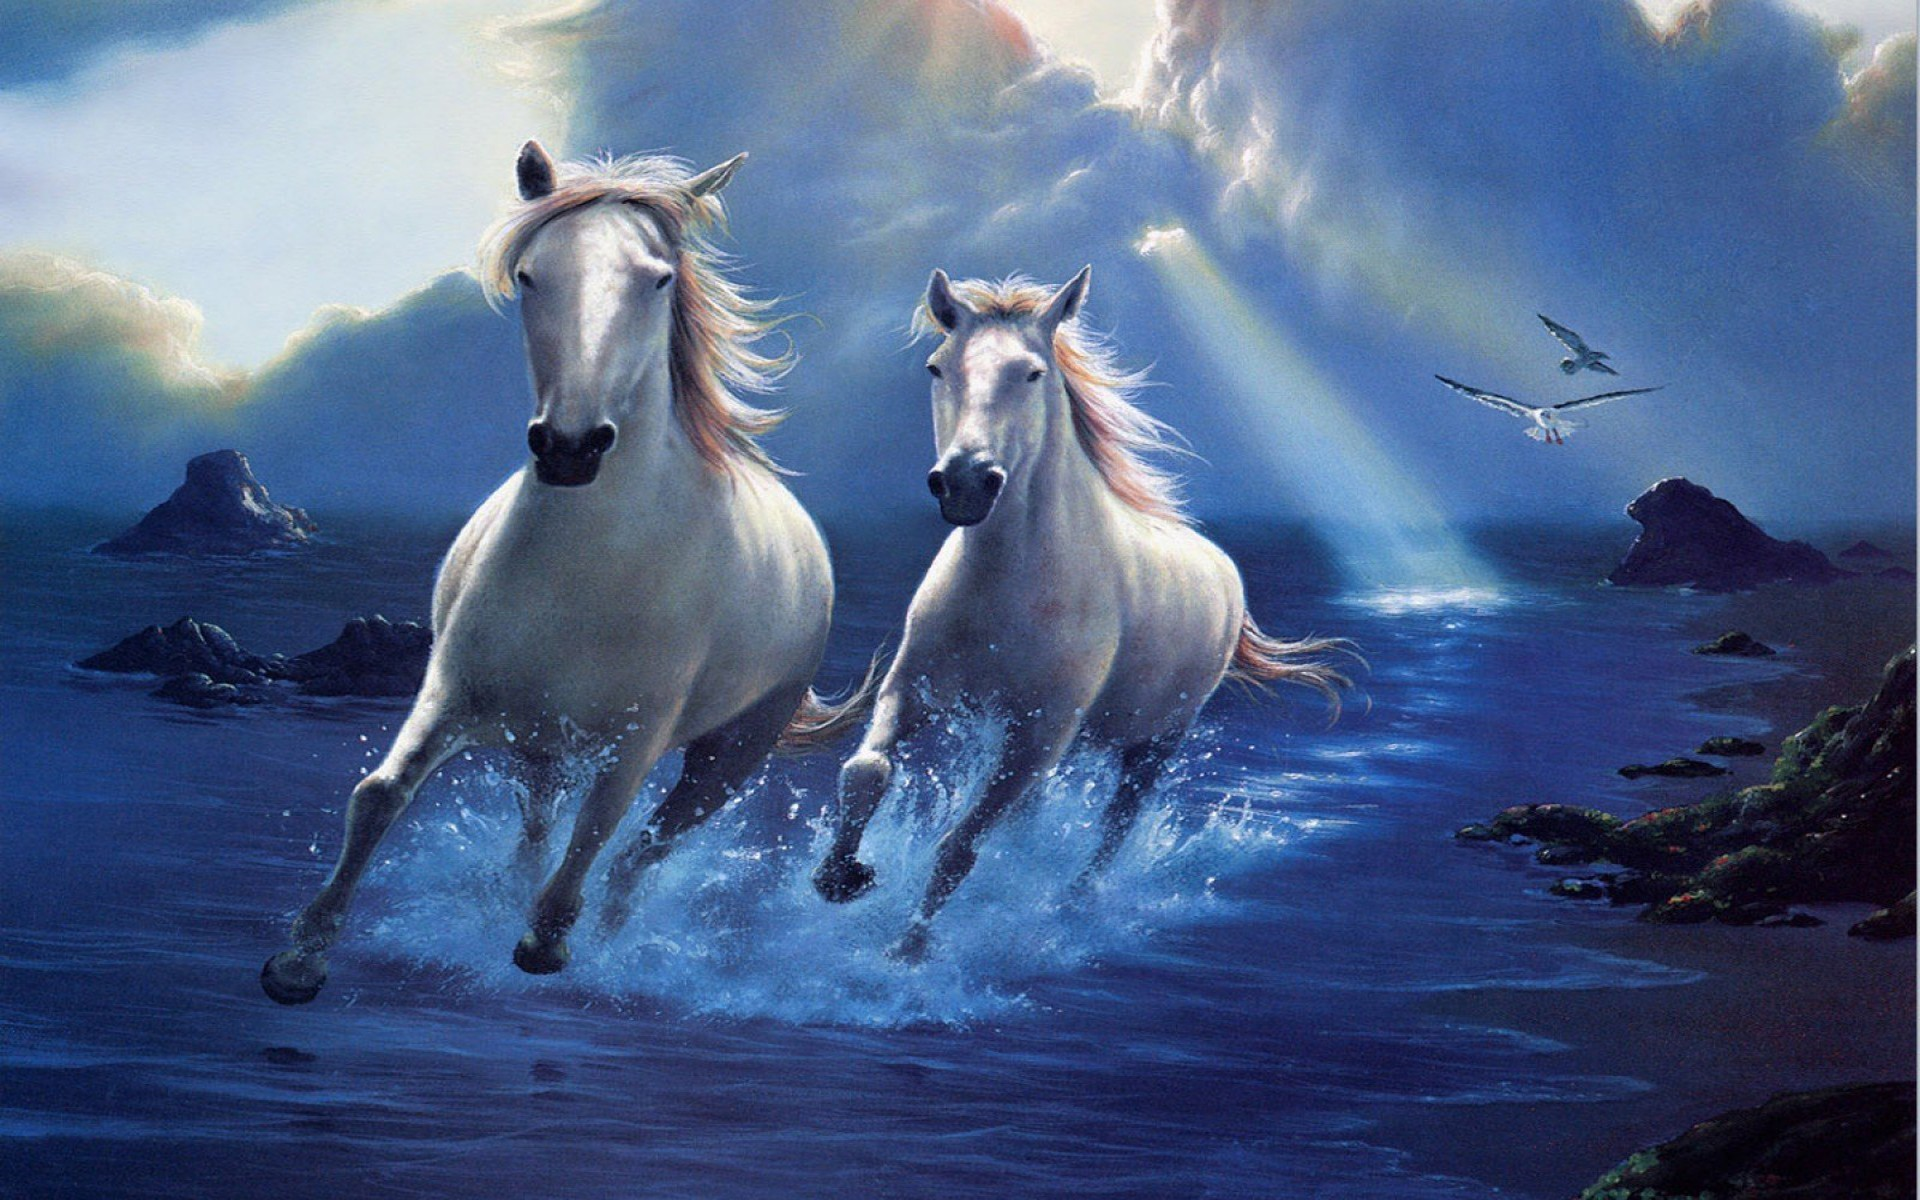 Running Horses Wallpaper Picserio Running Horse Wallpaper Hd 1920x1200 Download Hd Wallpaper Wallpapertip